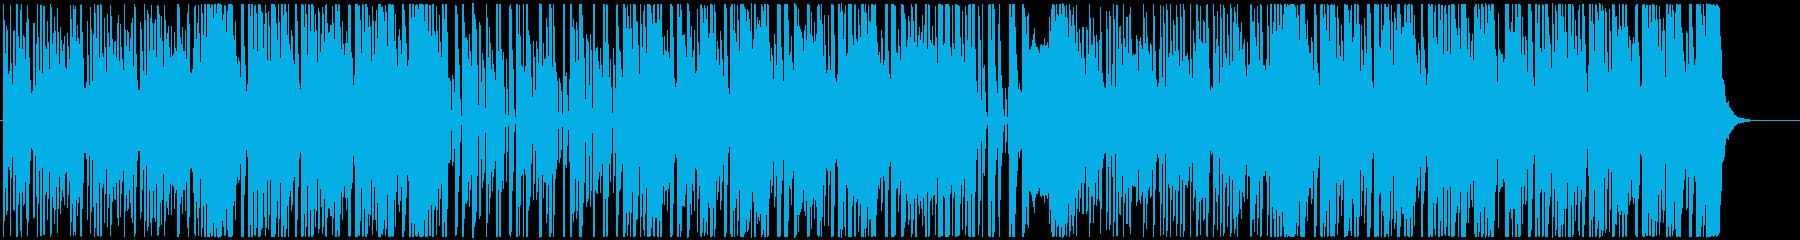 8bit chiptune R&Bの再生済みの波形